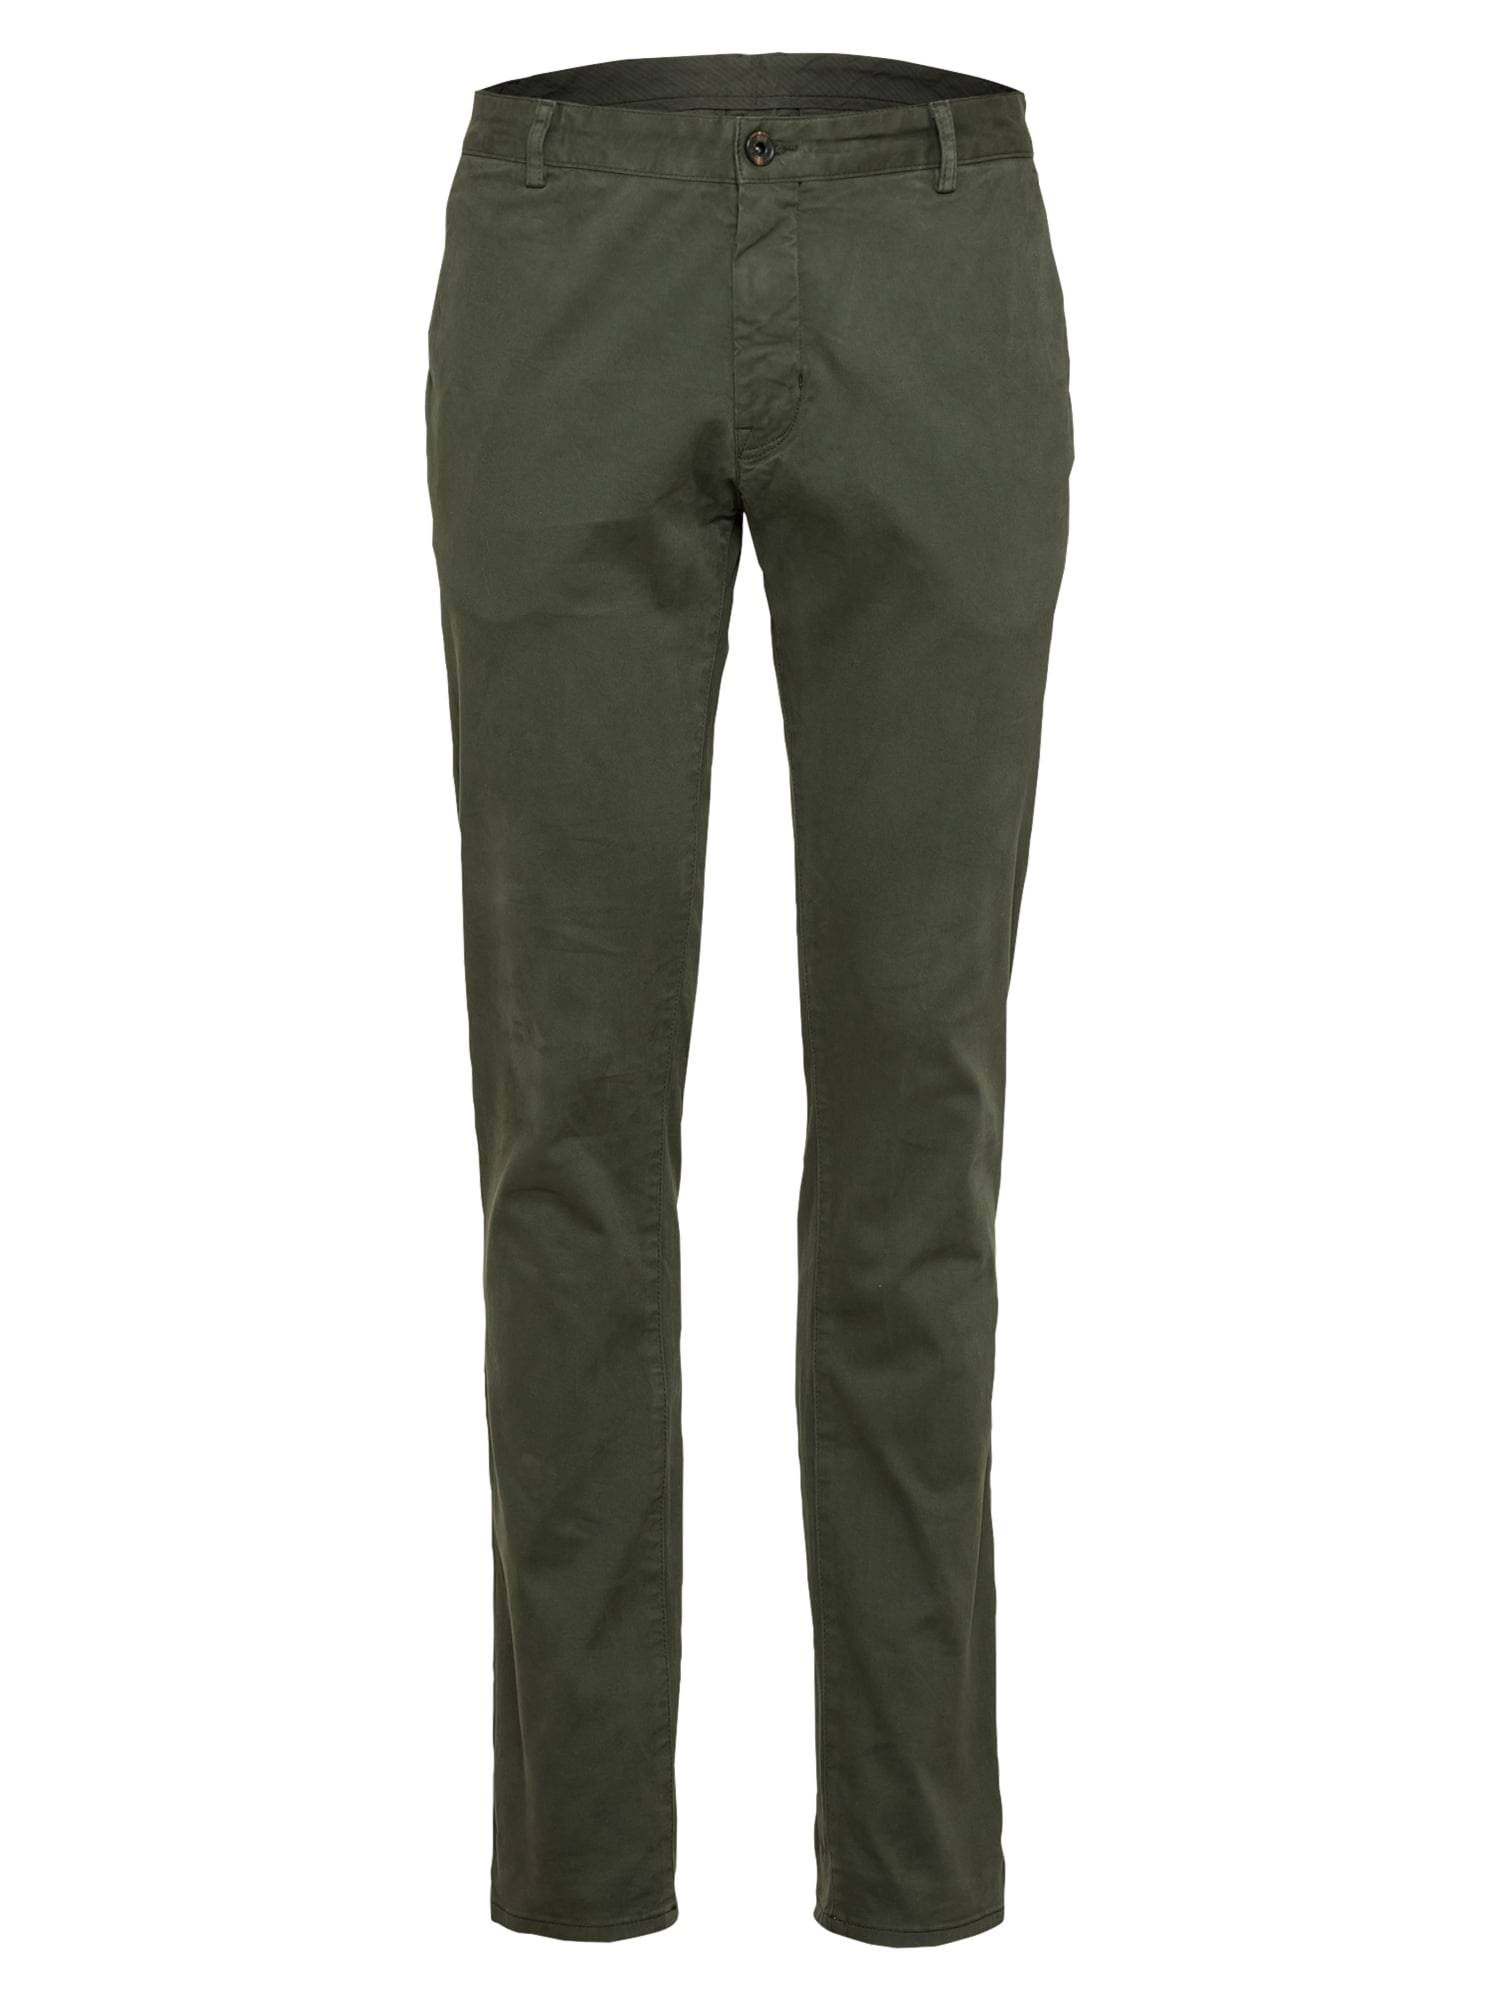 Tiger of Sweden Pantalon 'TRANSIT 4.'  - Vert - Taille: 30-32 - male